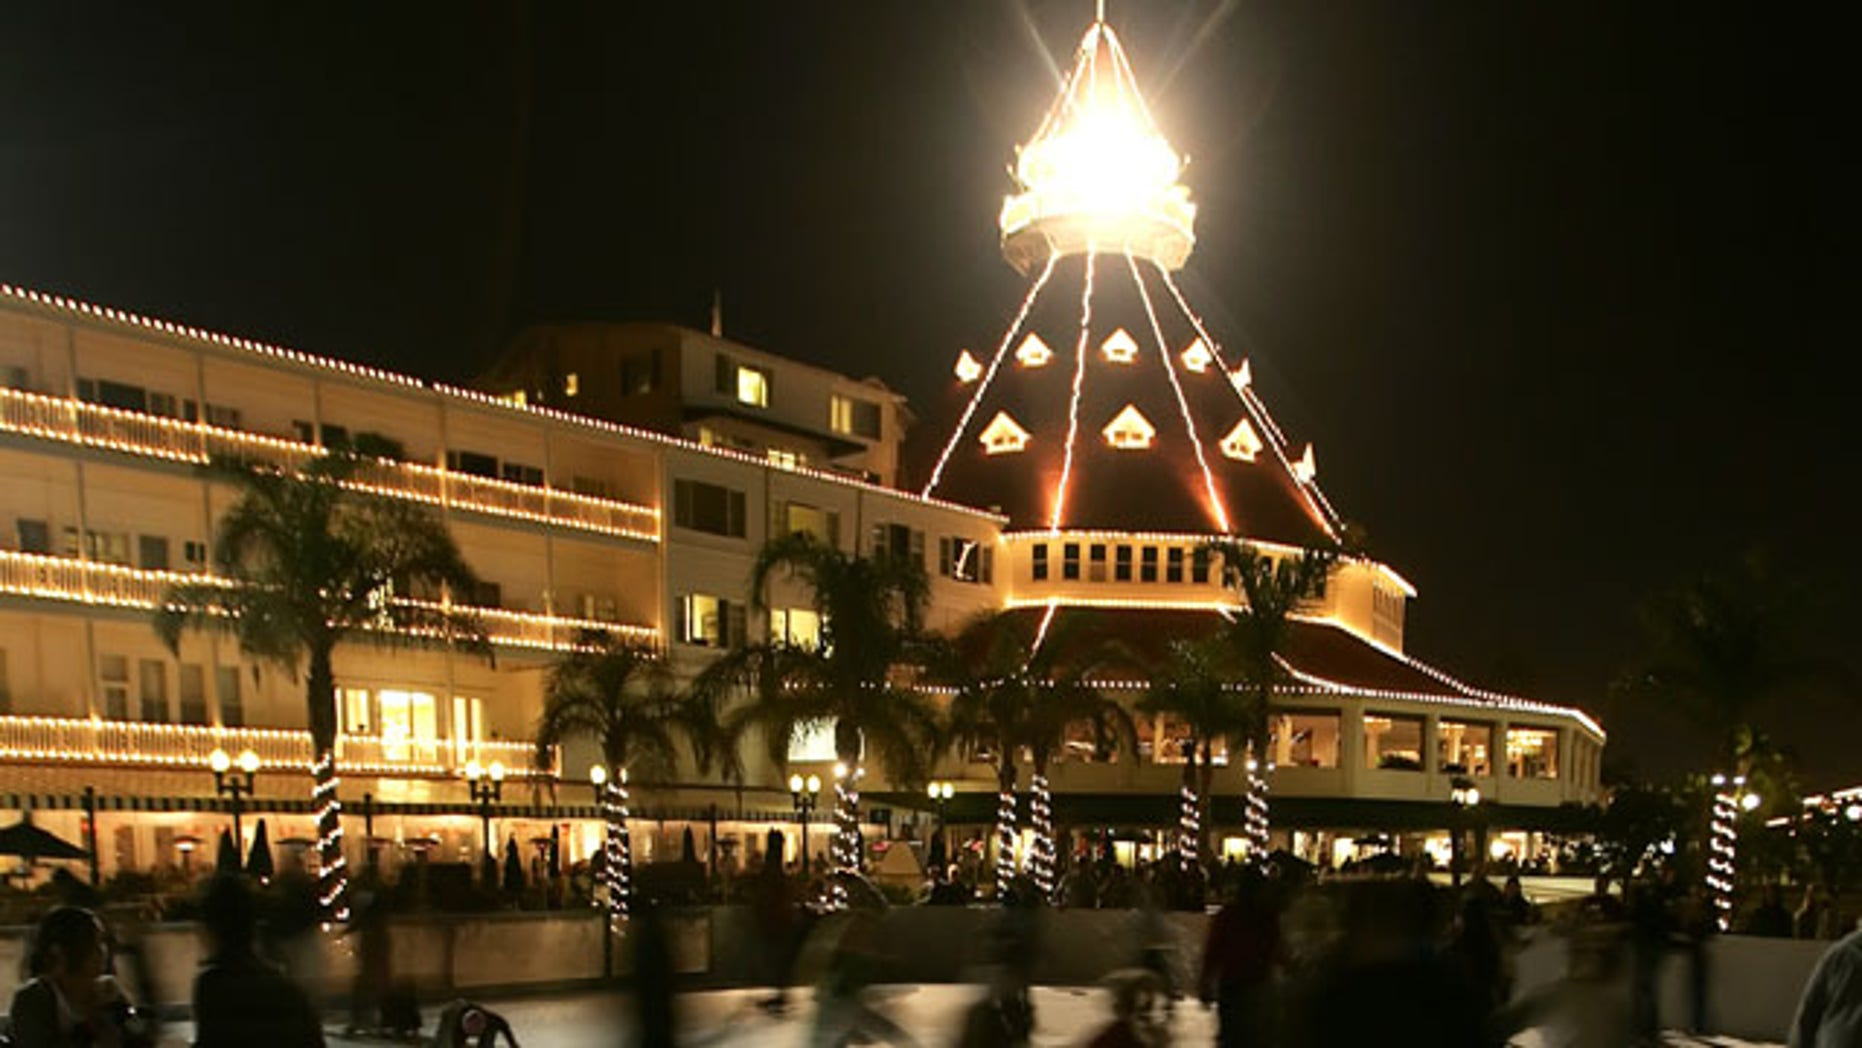 The Hotel Del Coronado in San Diego, California.